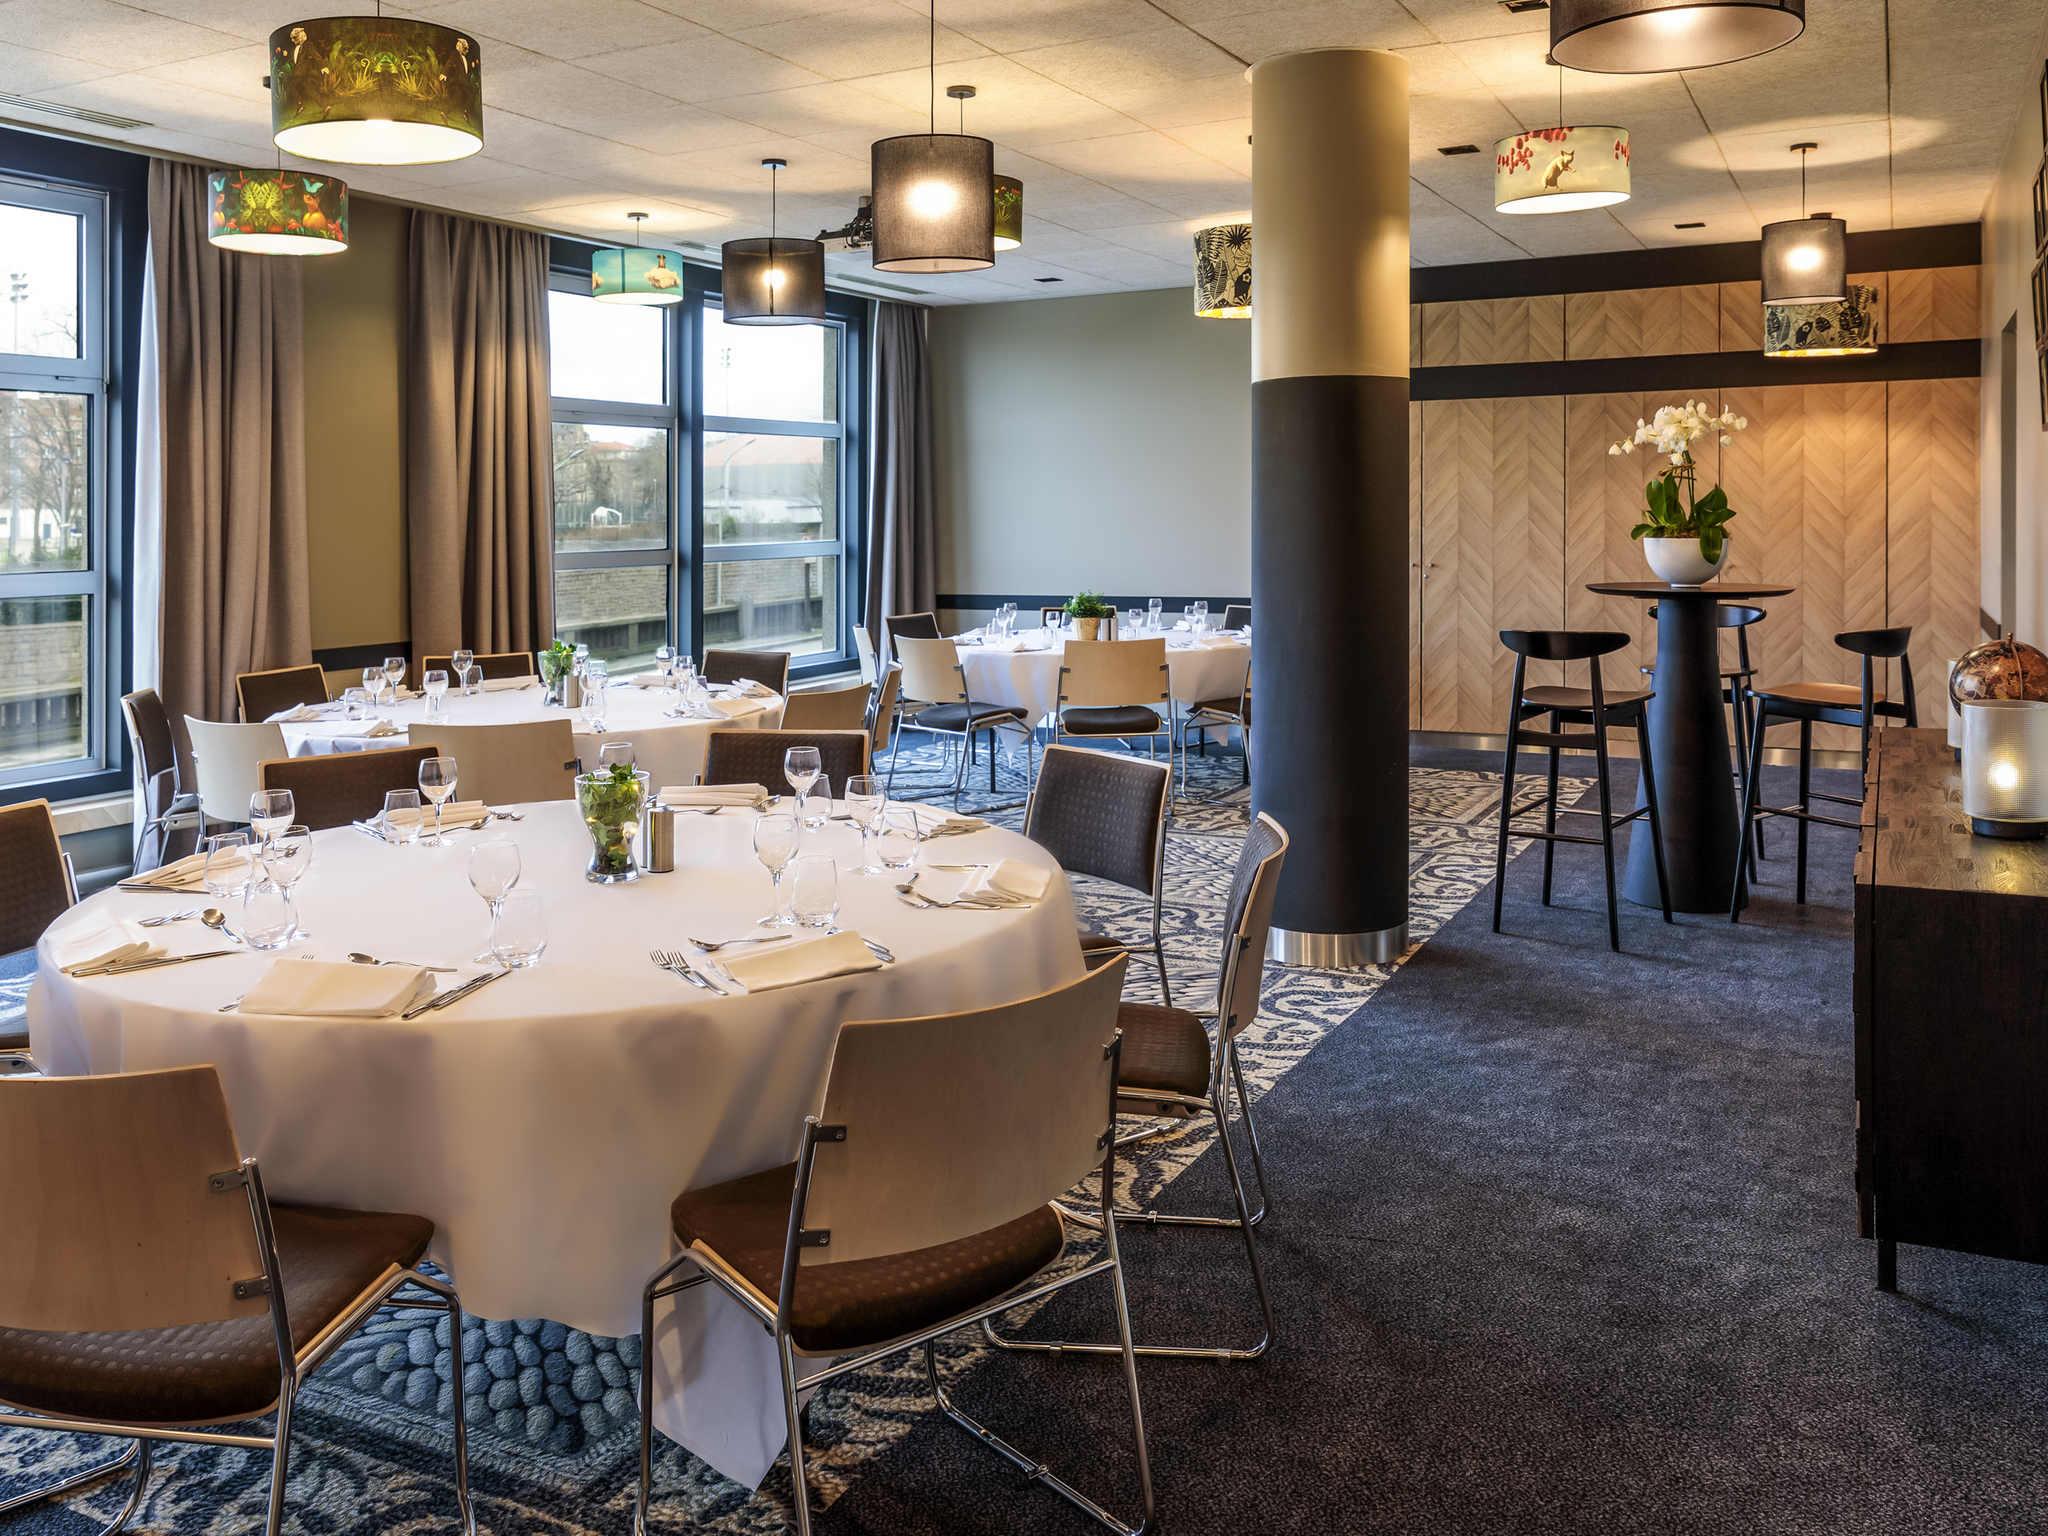 Hotel di novotel paris 14 porte d 39 orl ans novotel paris for Hotel porte orleans paris